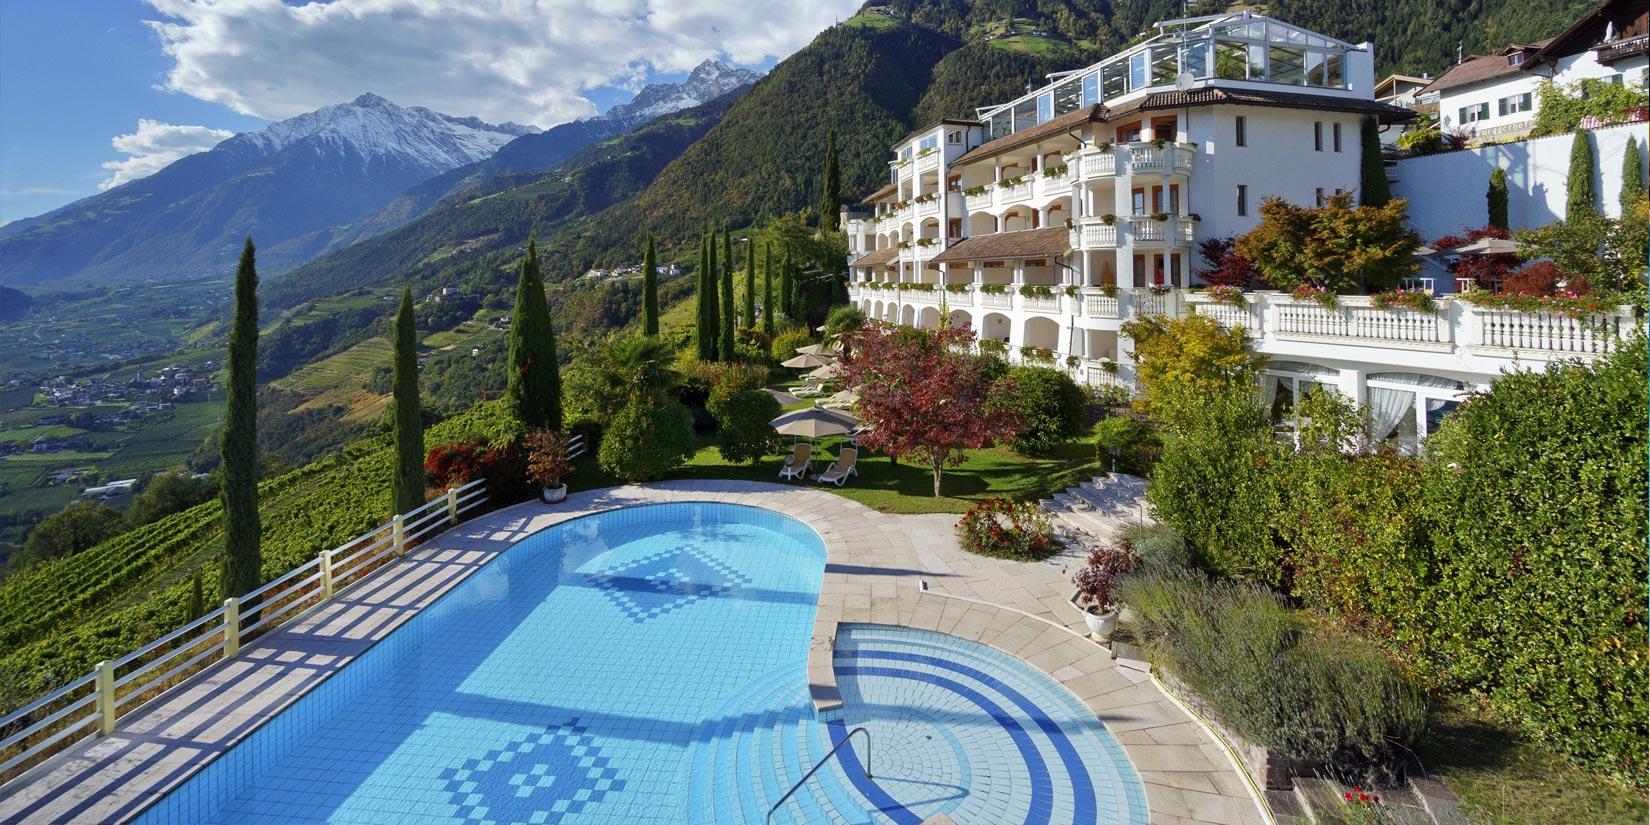 Hotel dorf tirol 4 sterne superior hotel bei meran for Design hotel dorf tirol